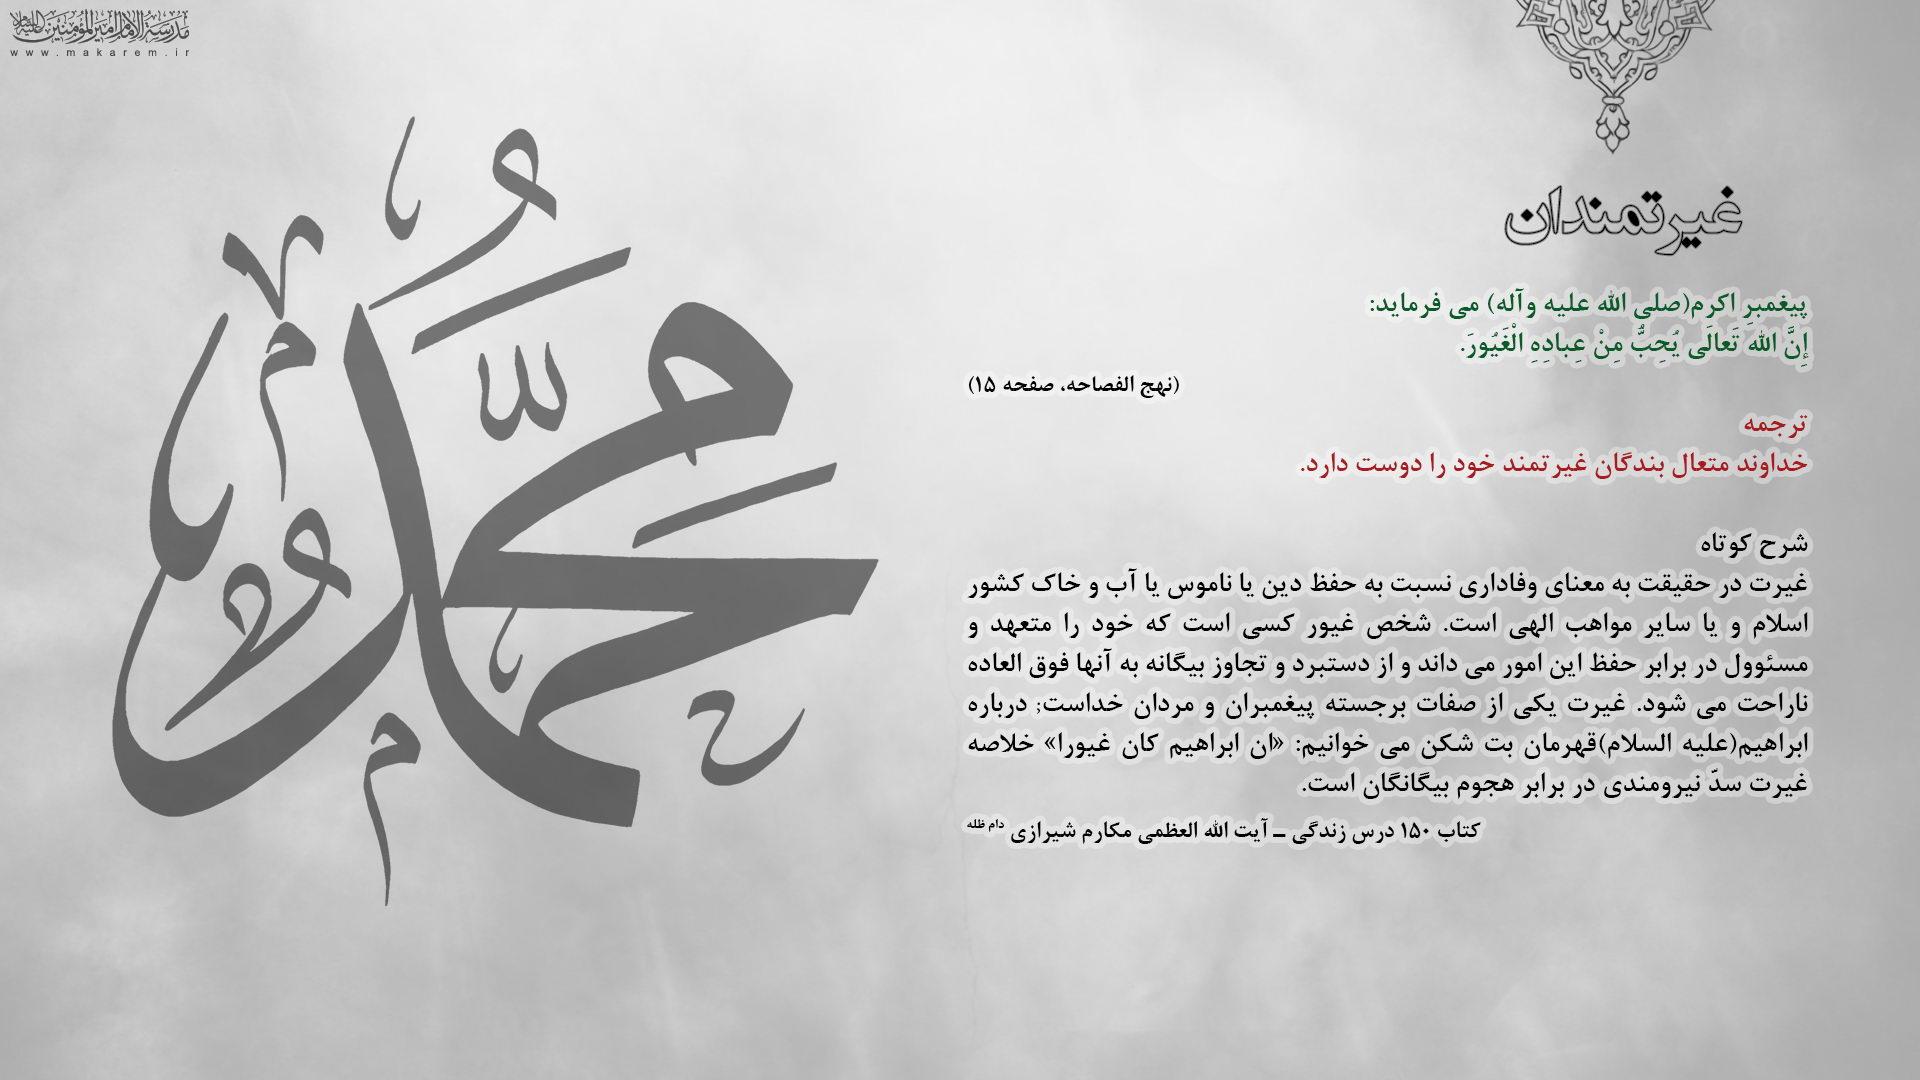 غیرتمندان-مدرسه الامام امیر المومنین (ع)